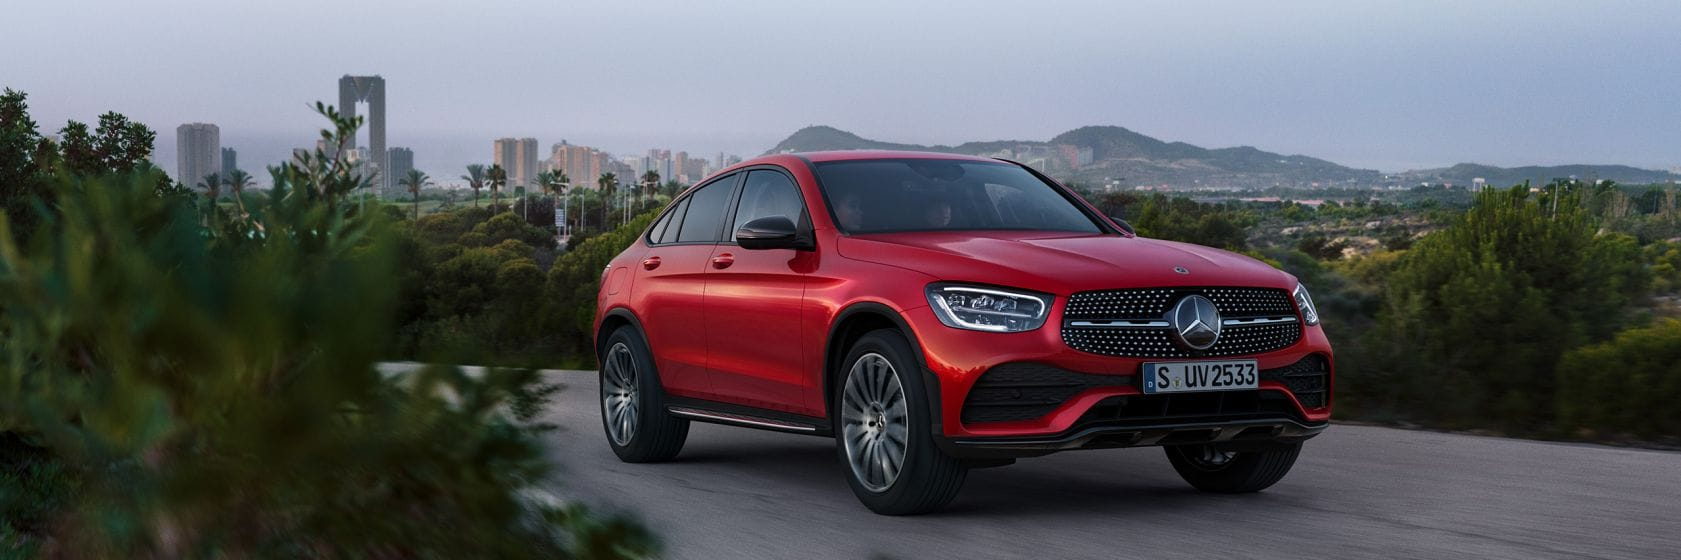 Інтер'єр та екстер'єр Mercedes–Benz GLC Coupe 2019